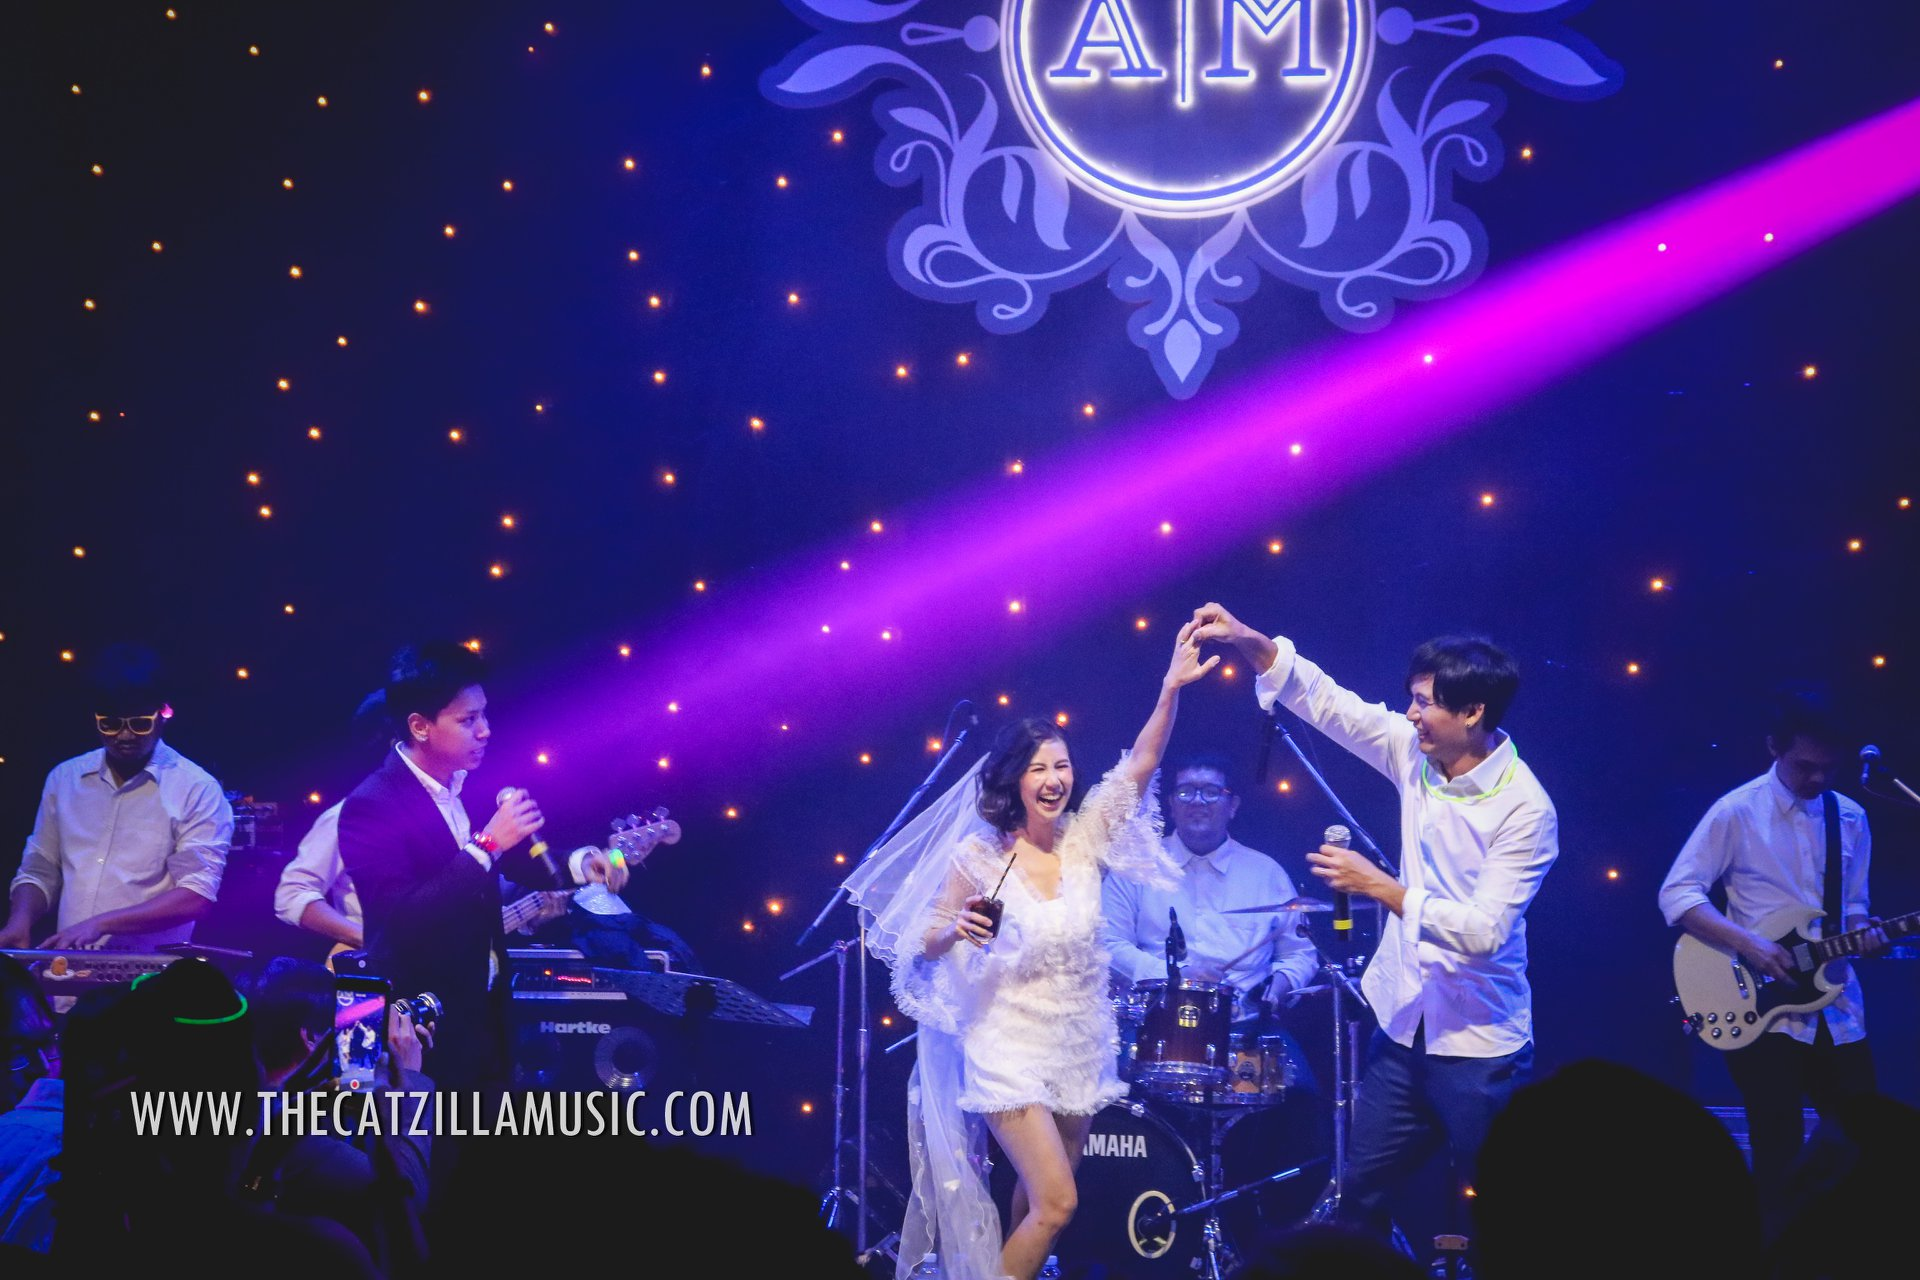 Wedding-บุ๋นแบนด์-Catzilla-วงดนตรี after party ราคา-จ้างวงดนตรีสด-วงดนตรีงานแต่ง-วงดนตรีงานเลี้ยง-After Party